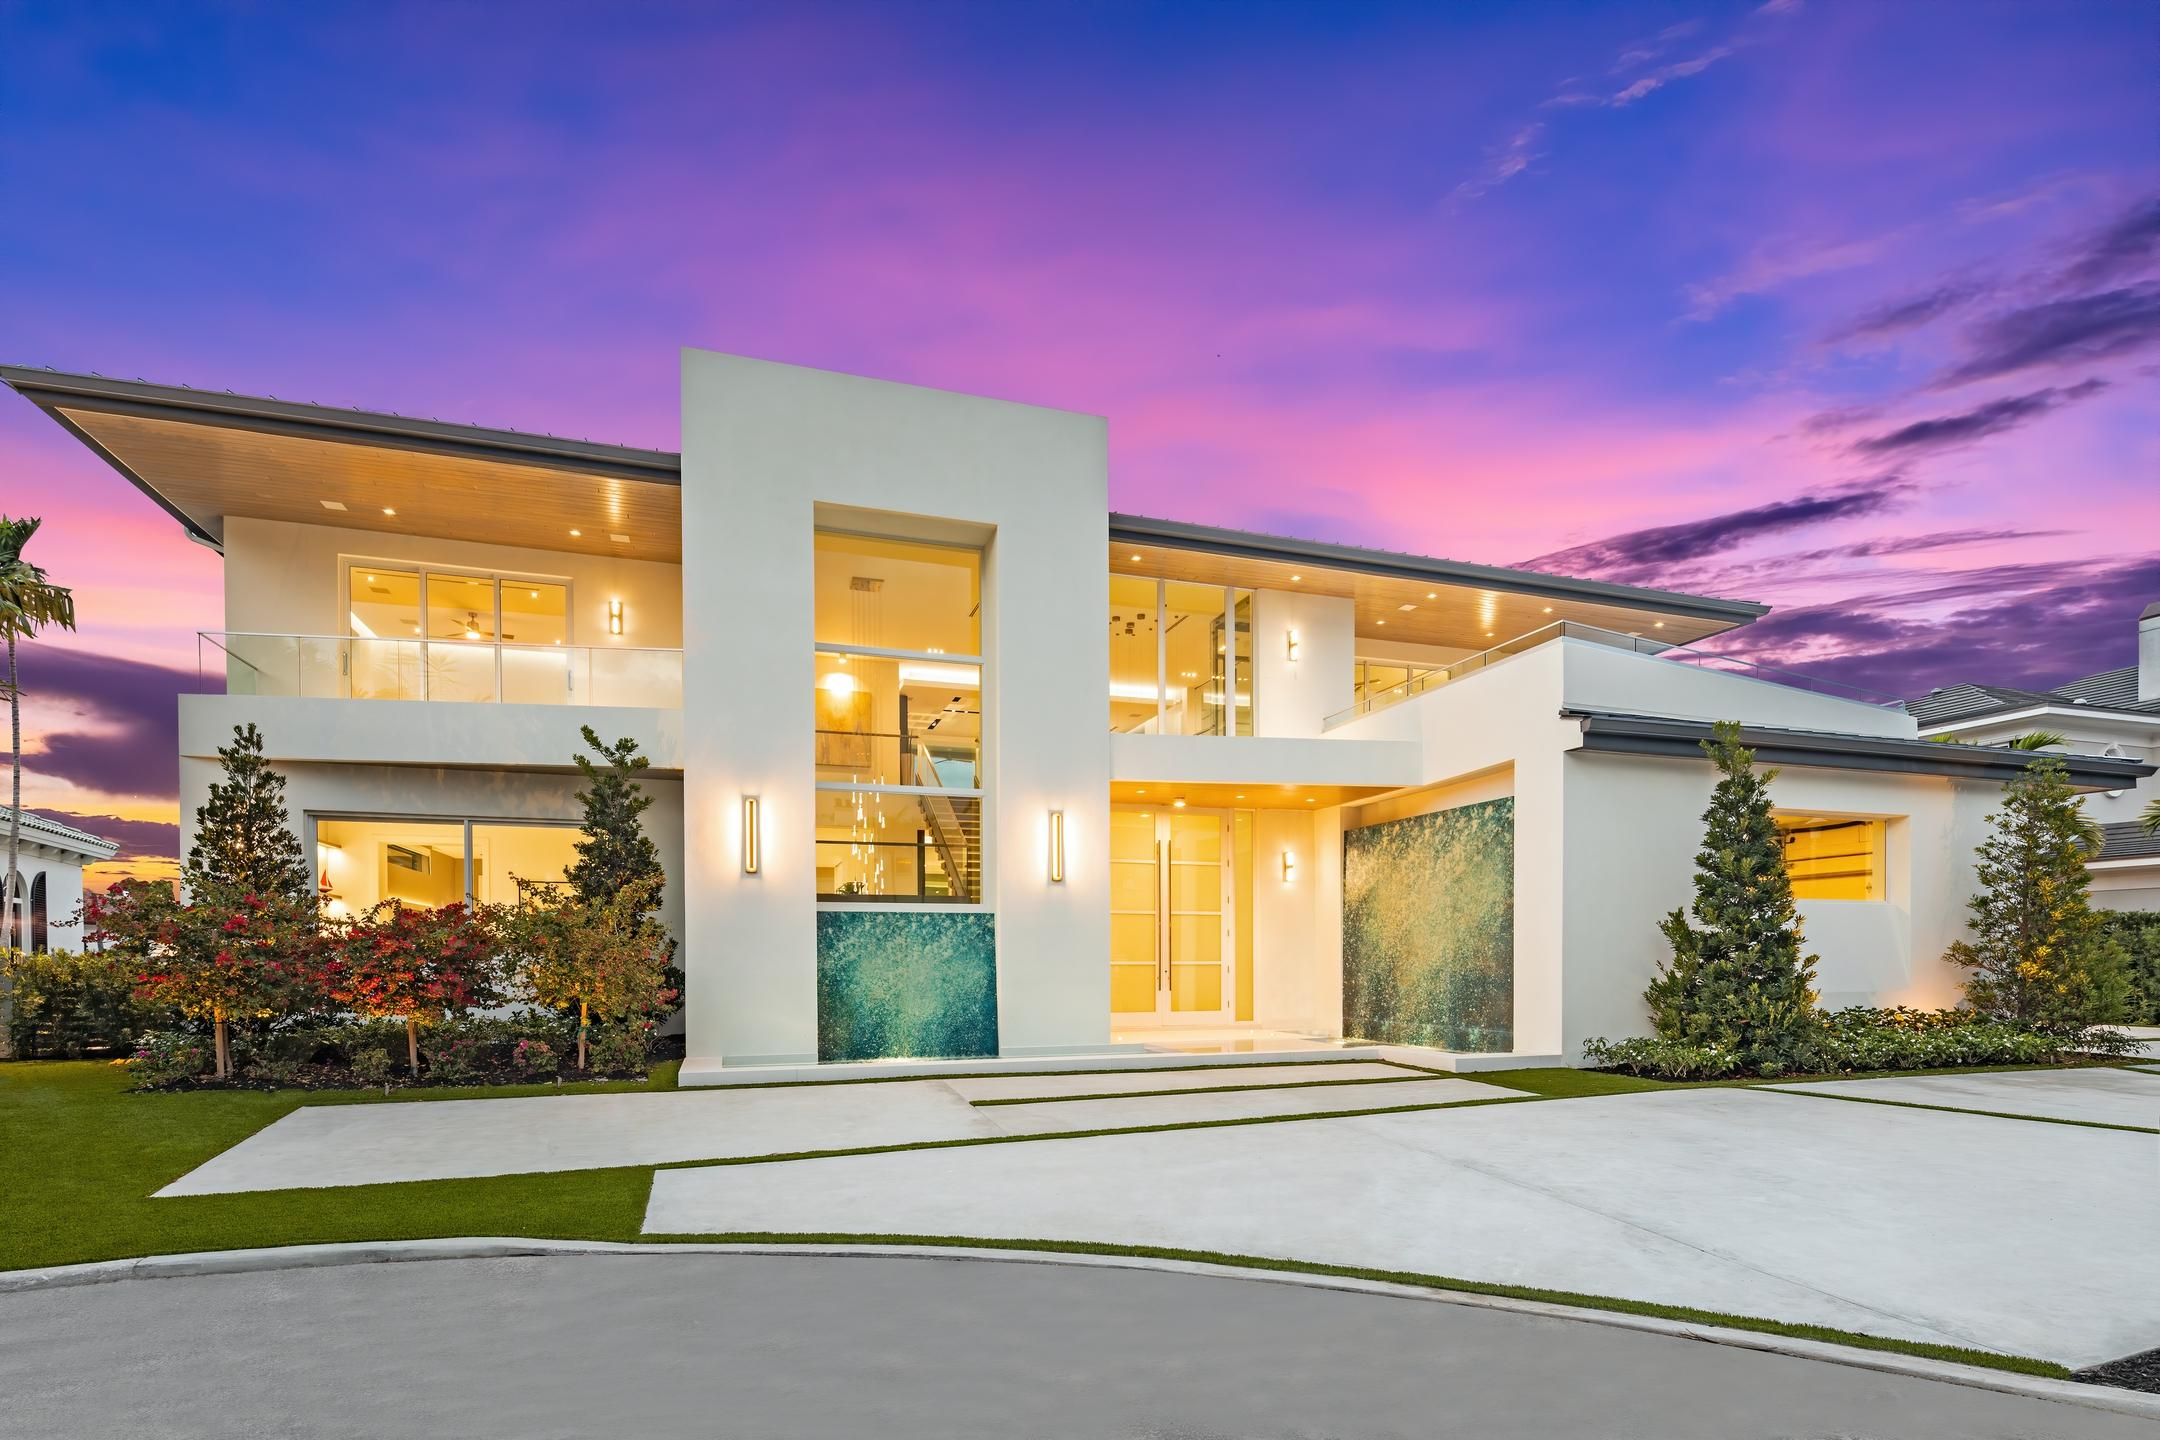 Photo of 151 W Alexander Palm Road, Boca Raton, FL 33432